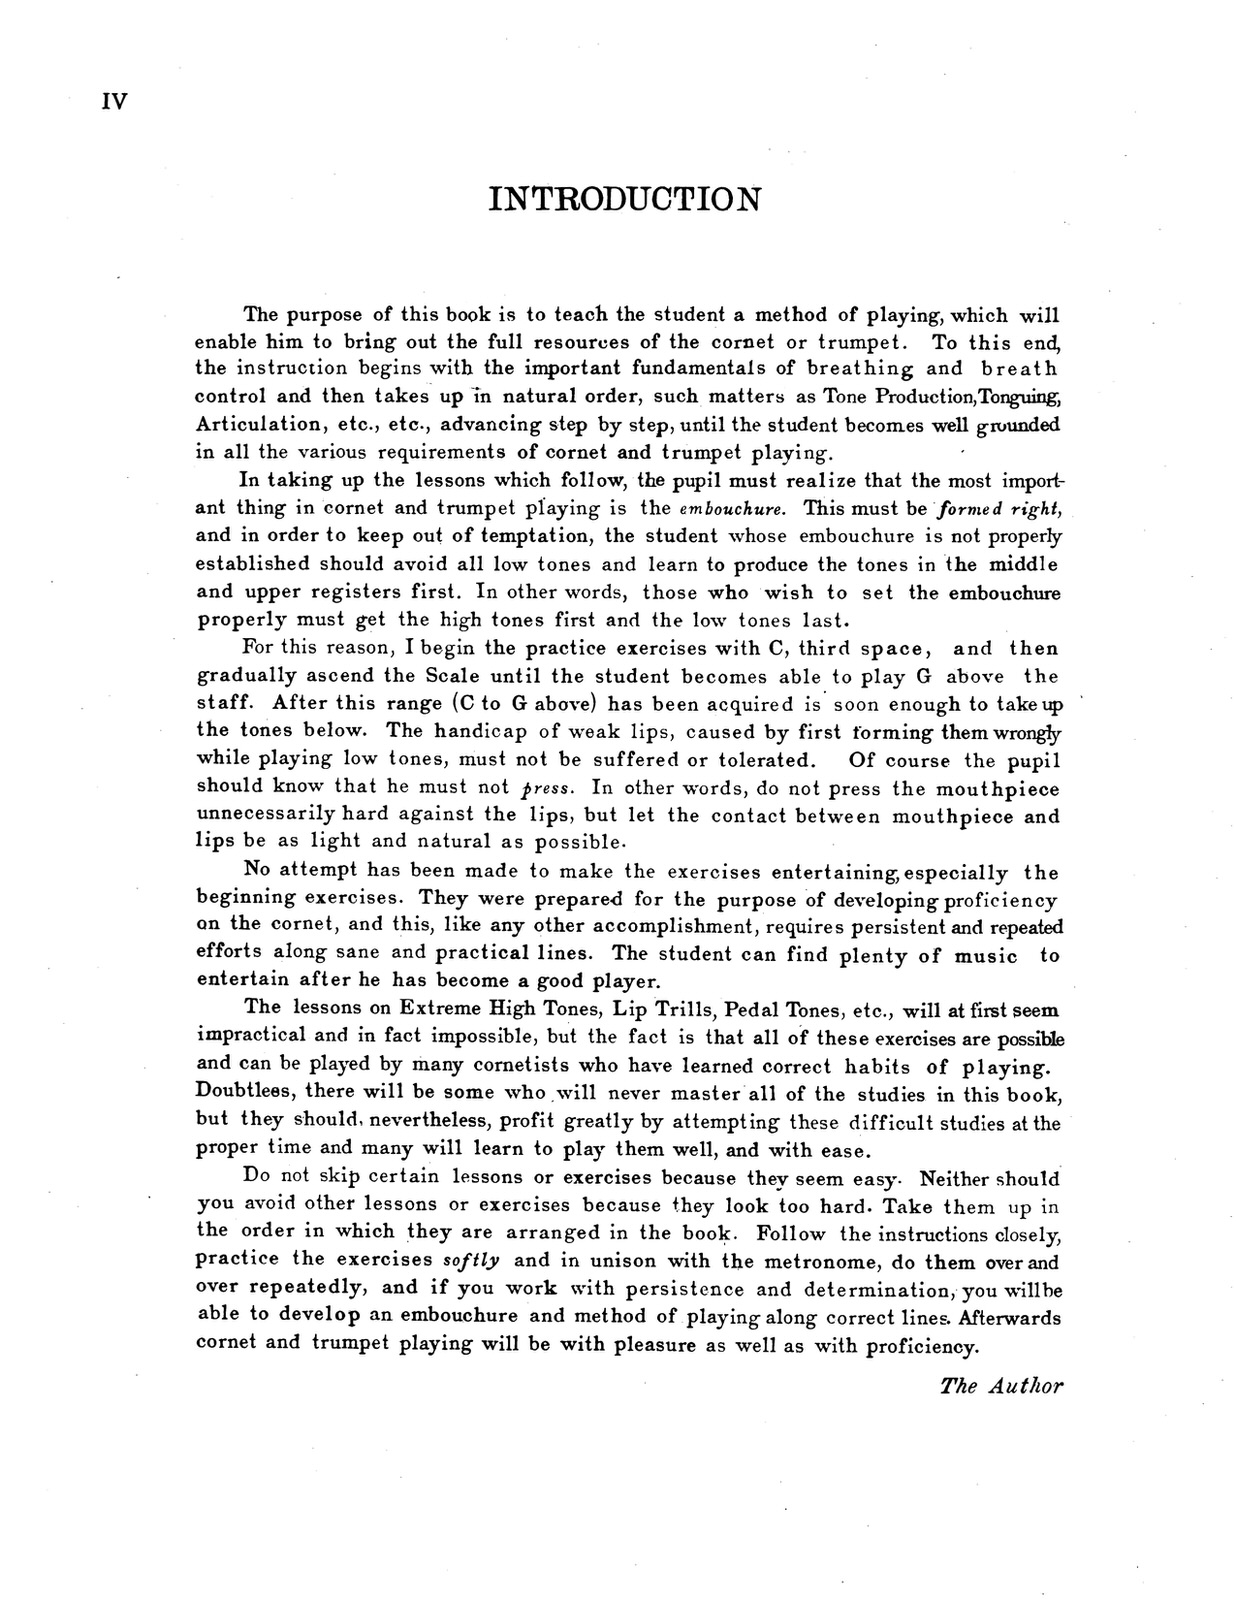 Eby, Walter Scientific Method for Trumpet Volume 1 2